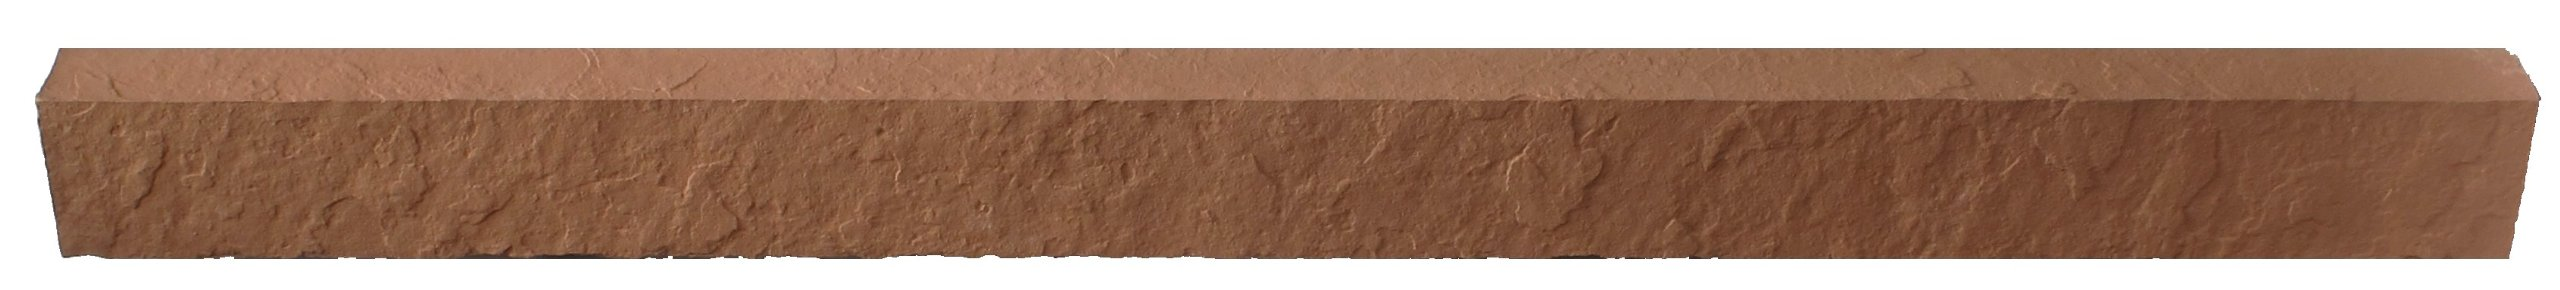 NextStone 6NWTS1 Window/Door Trim 4-Pack, Sedona Red